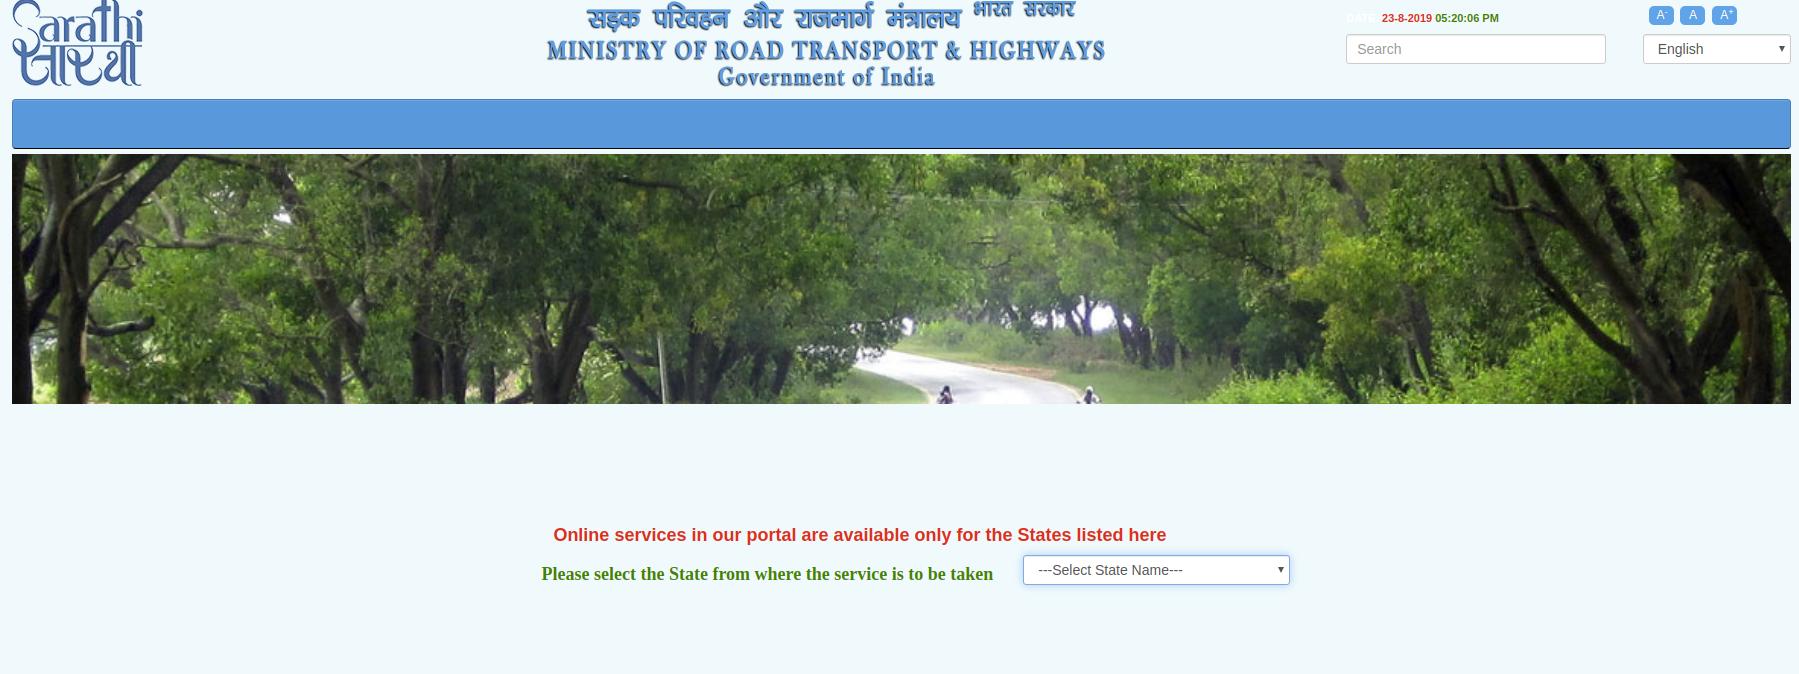 Driving Licence Renewal - Image 1